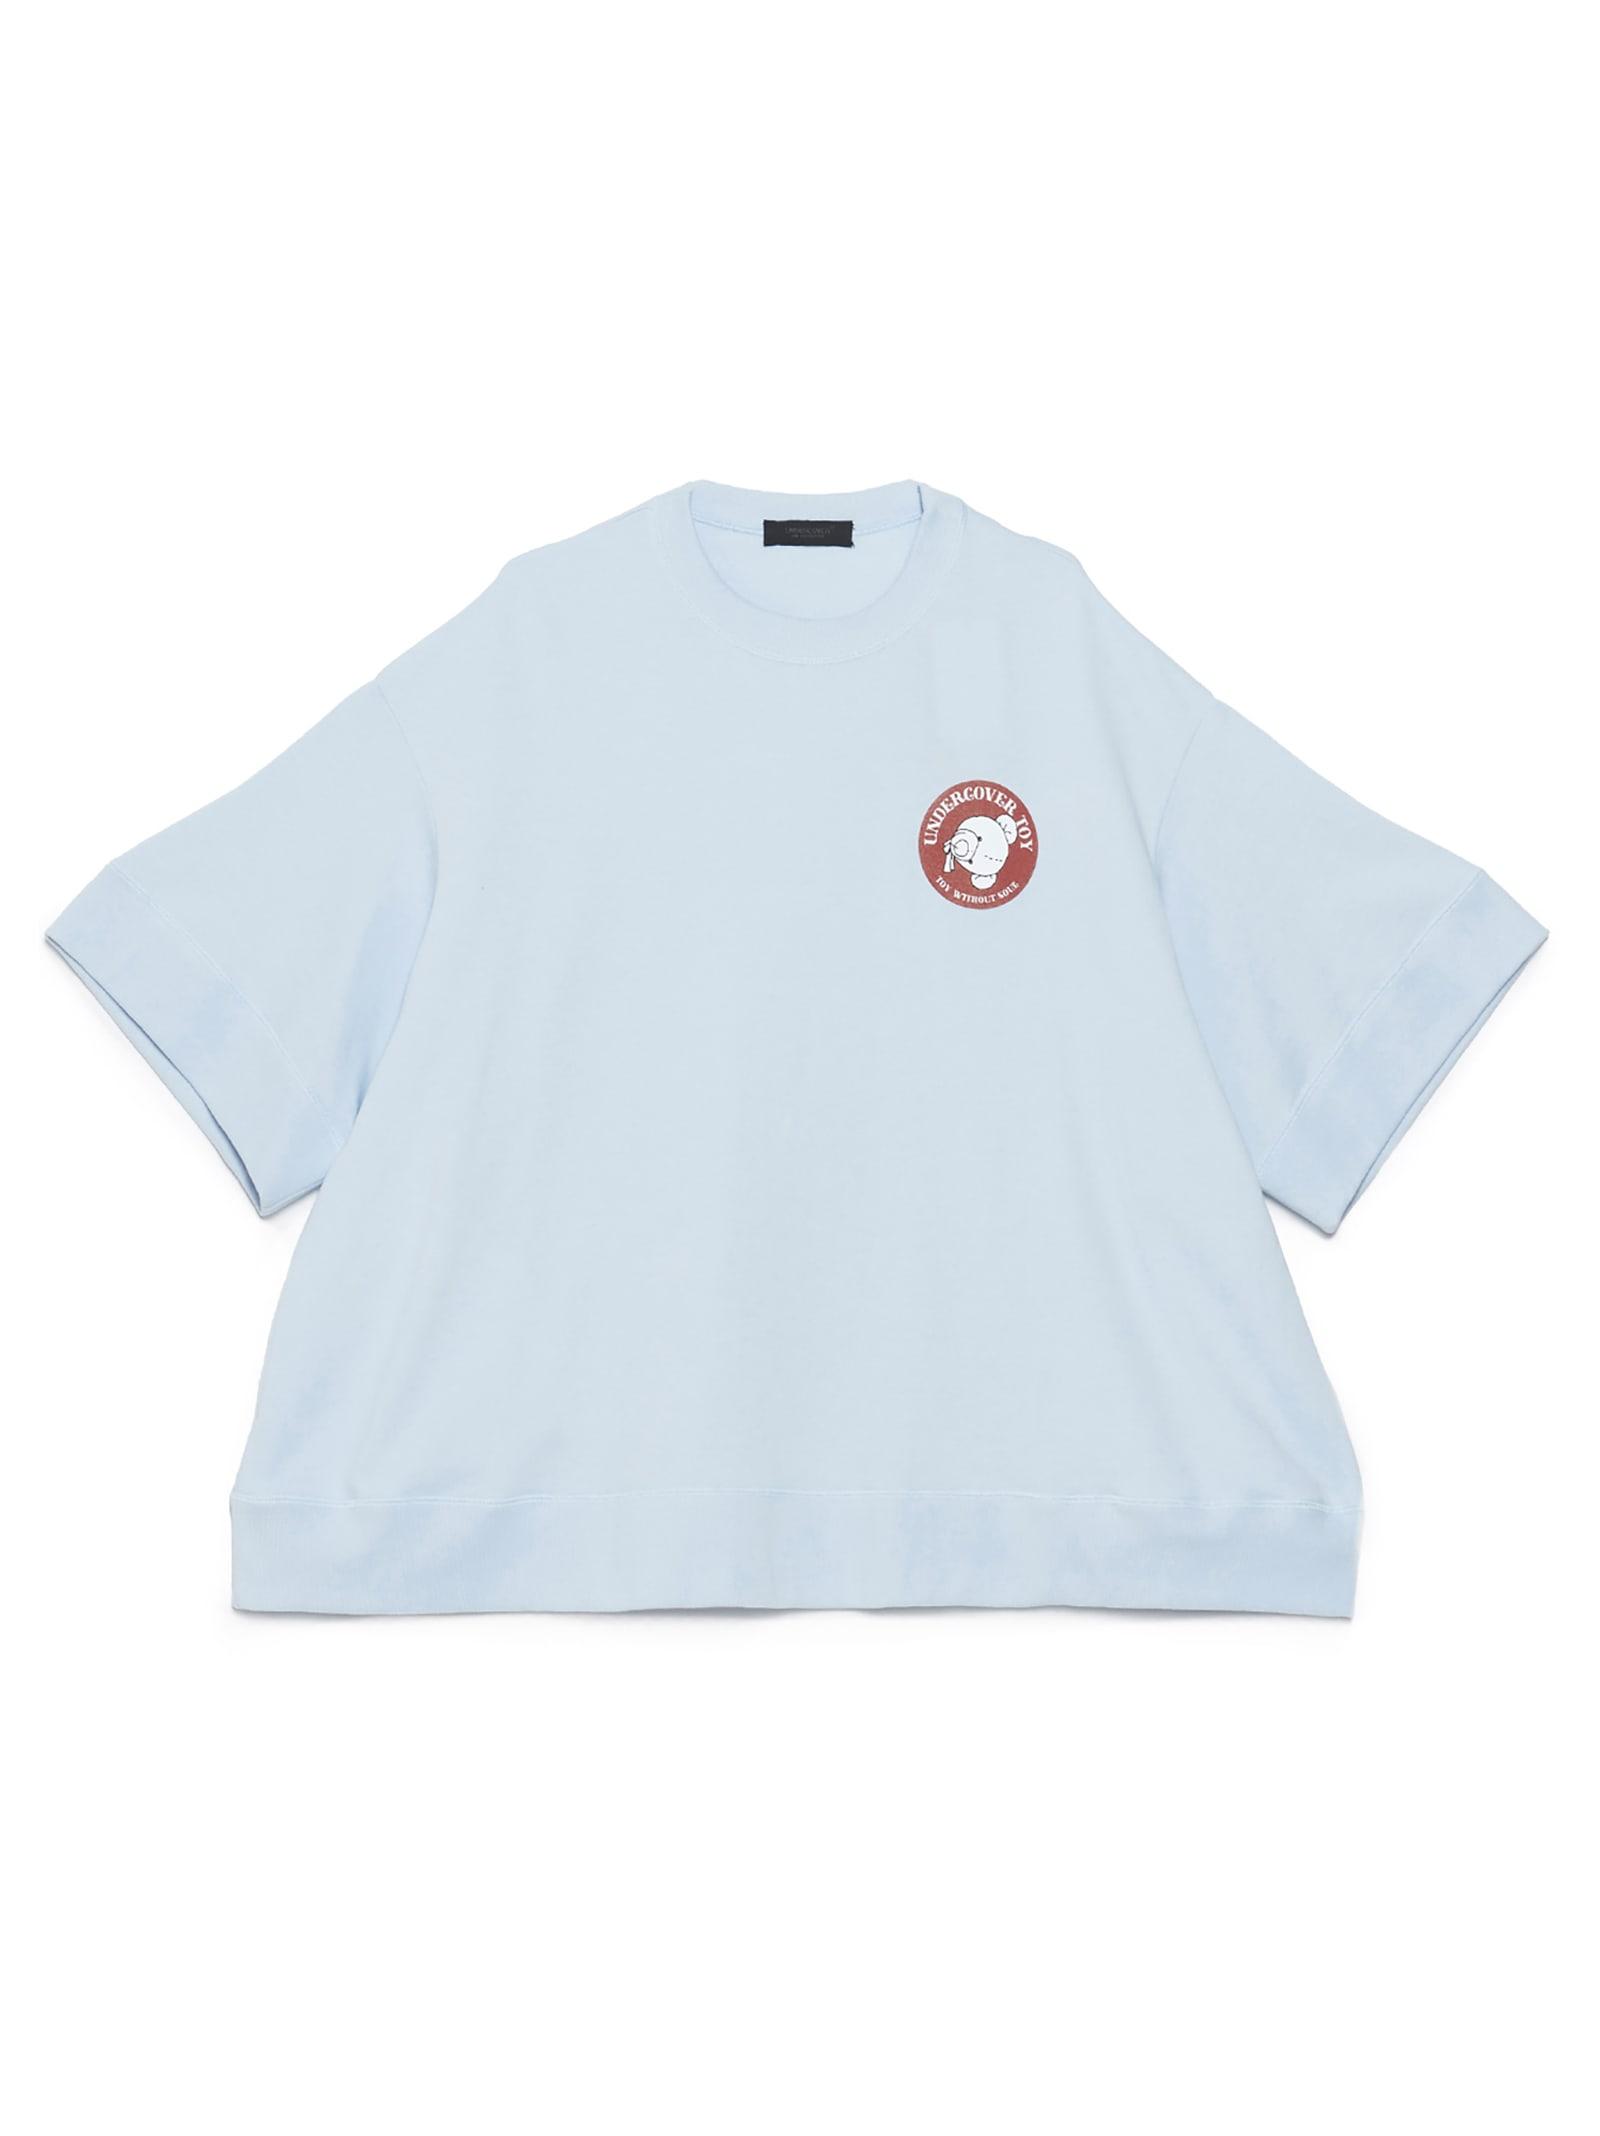 Undercover Jun Takahashi undercover Toy Sweatshirt